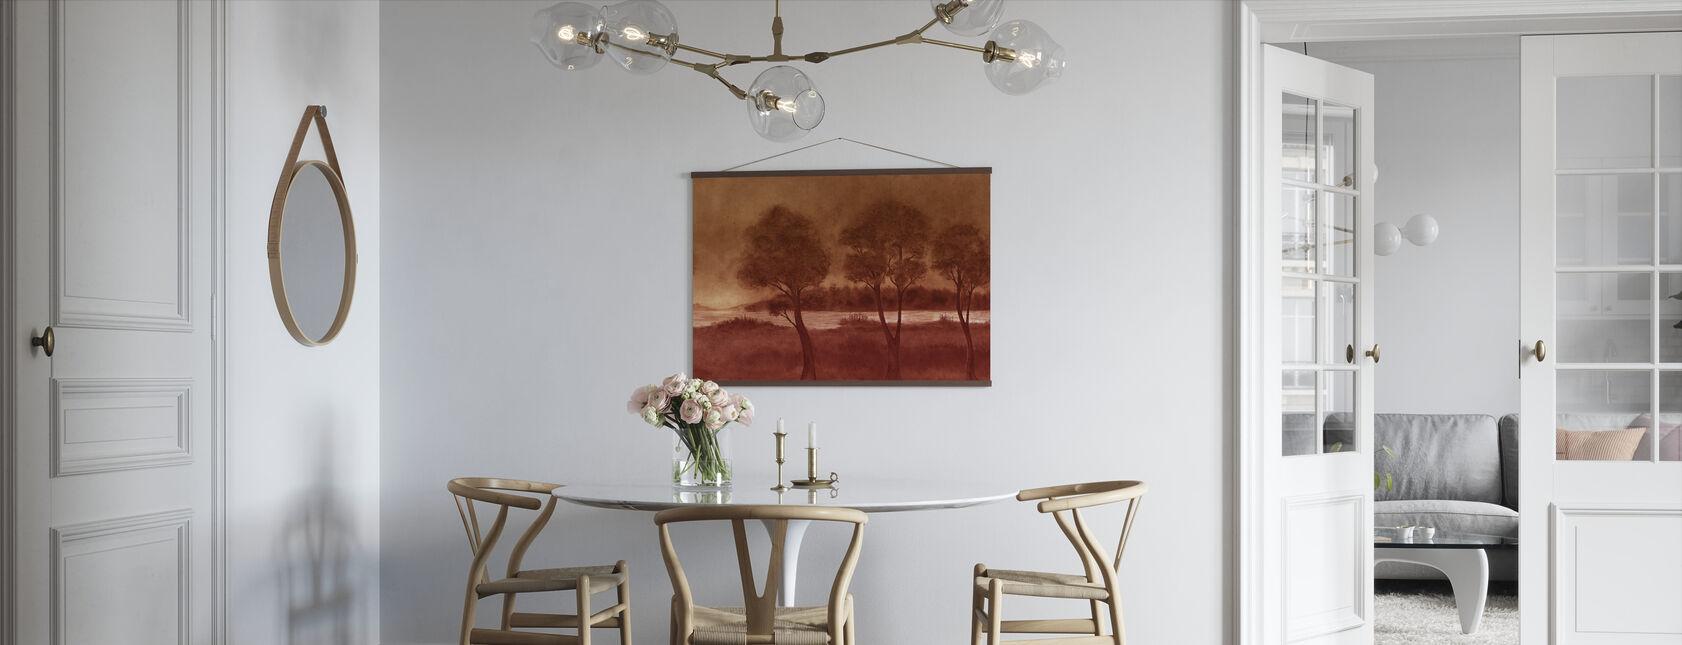 Bonny Scenery - Hazel - Poster - Kitchen